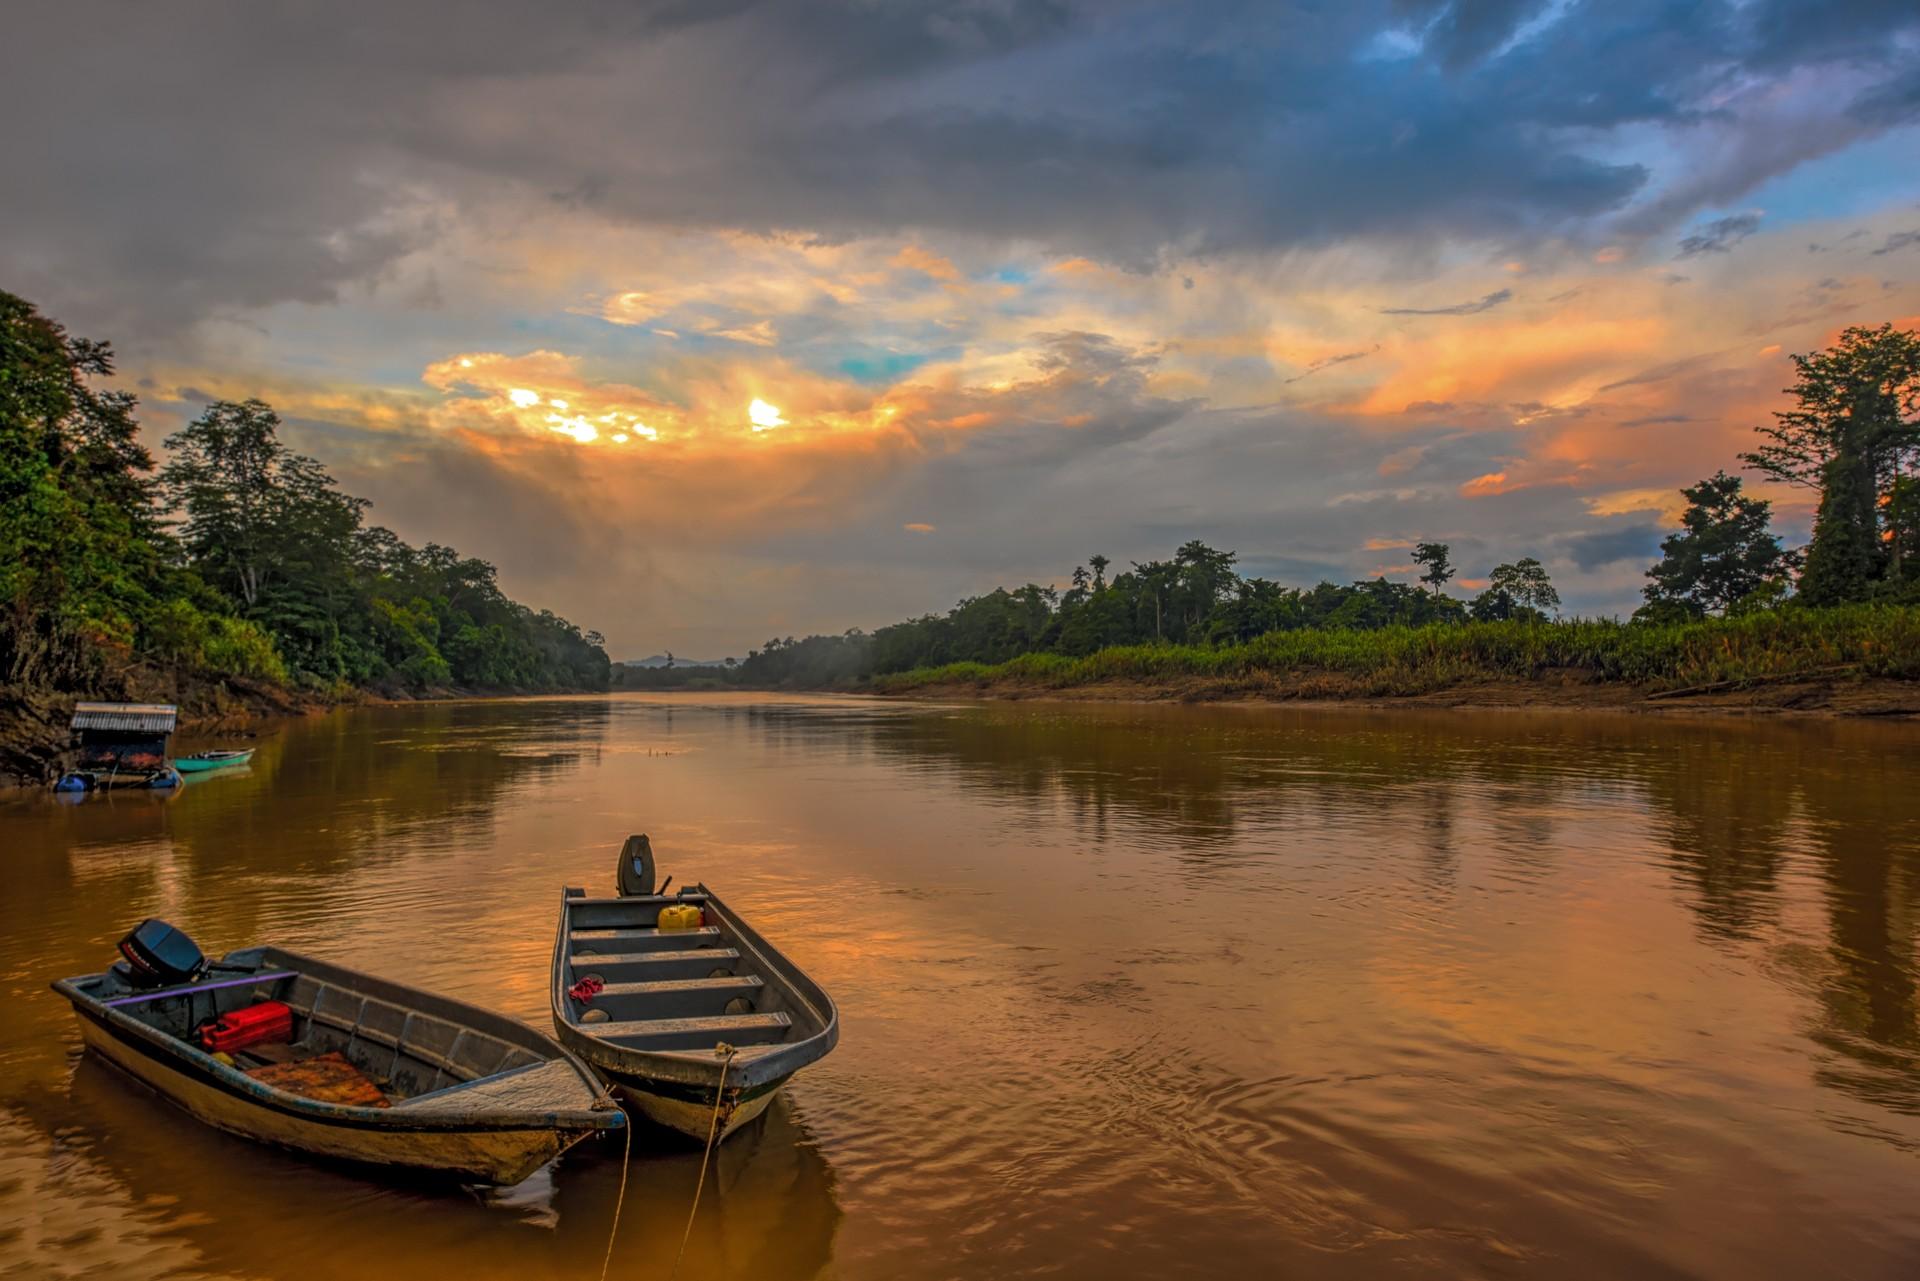 Top 10 scenic journeys: Kinabatangan River